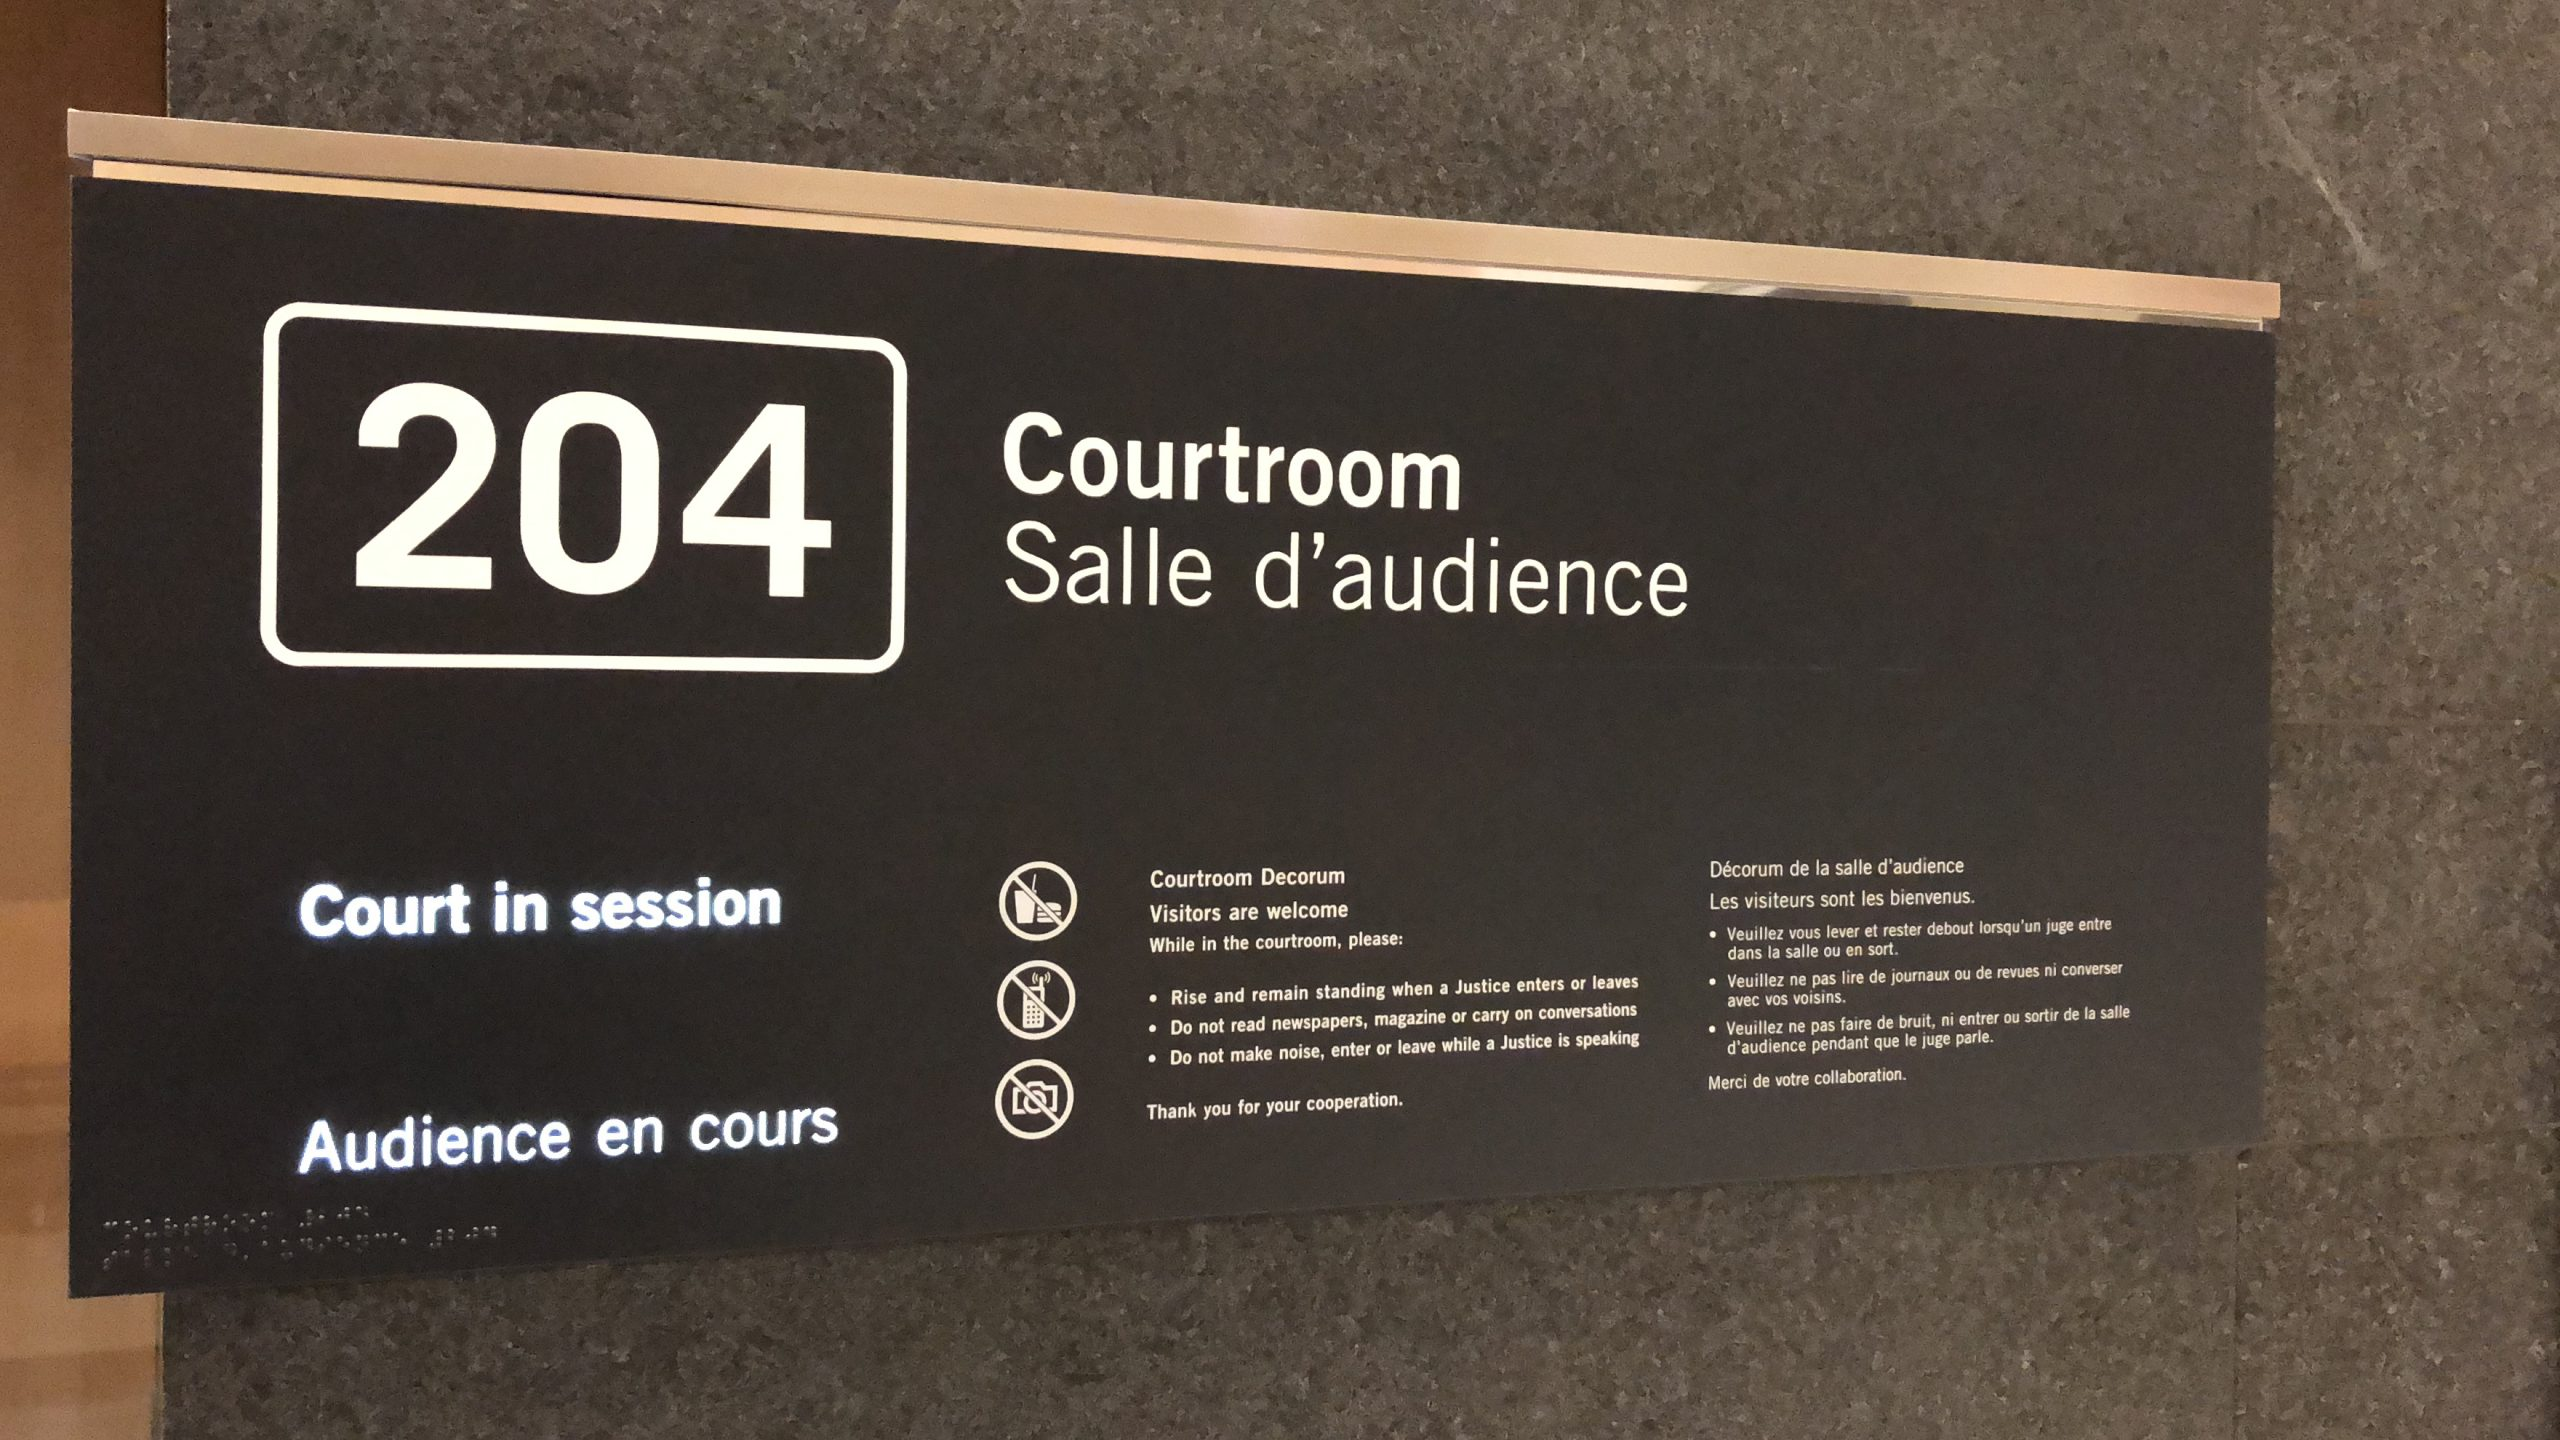 2015 Sexual Assault Trial Postponed